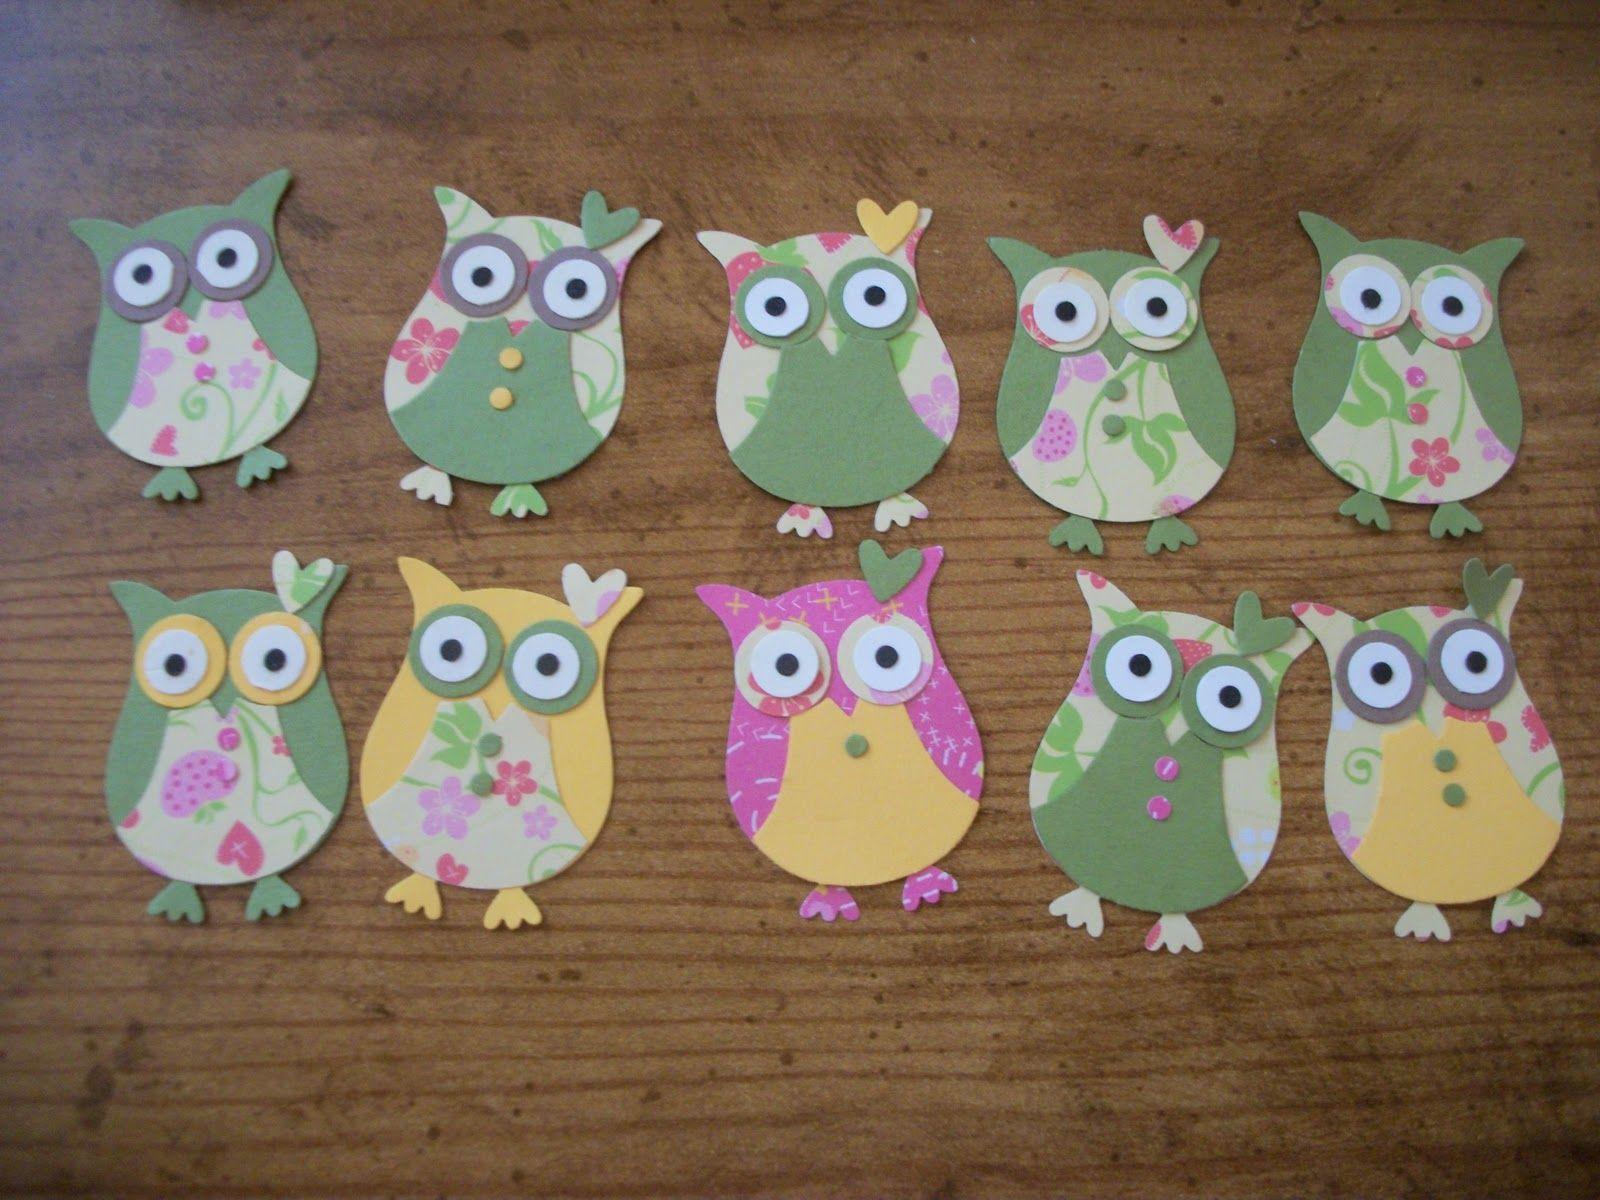 Cute Owl Craft Using Scrapbook Papers Cute To Decorate A